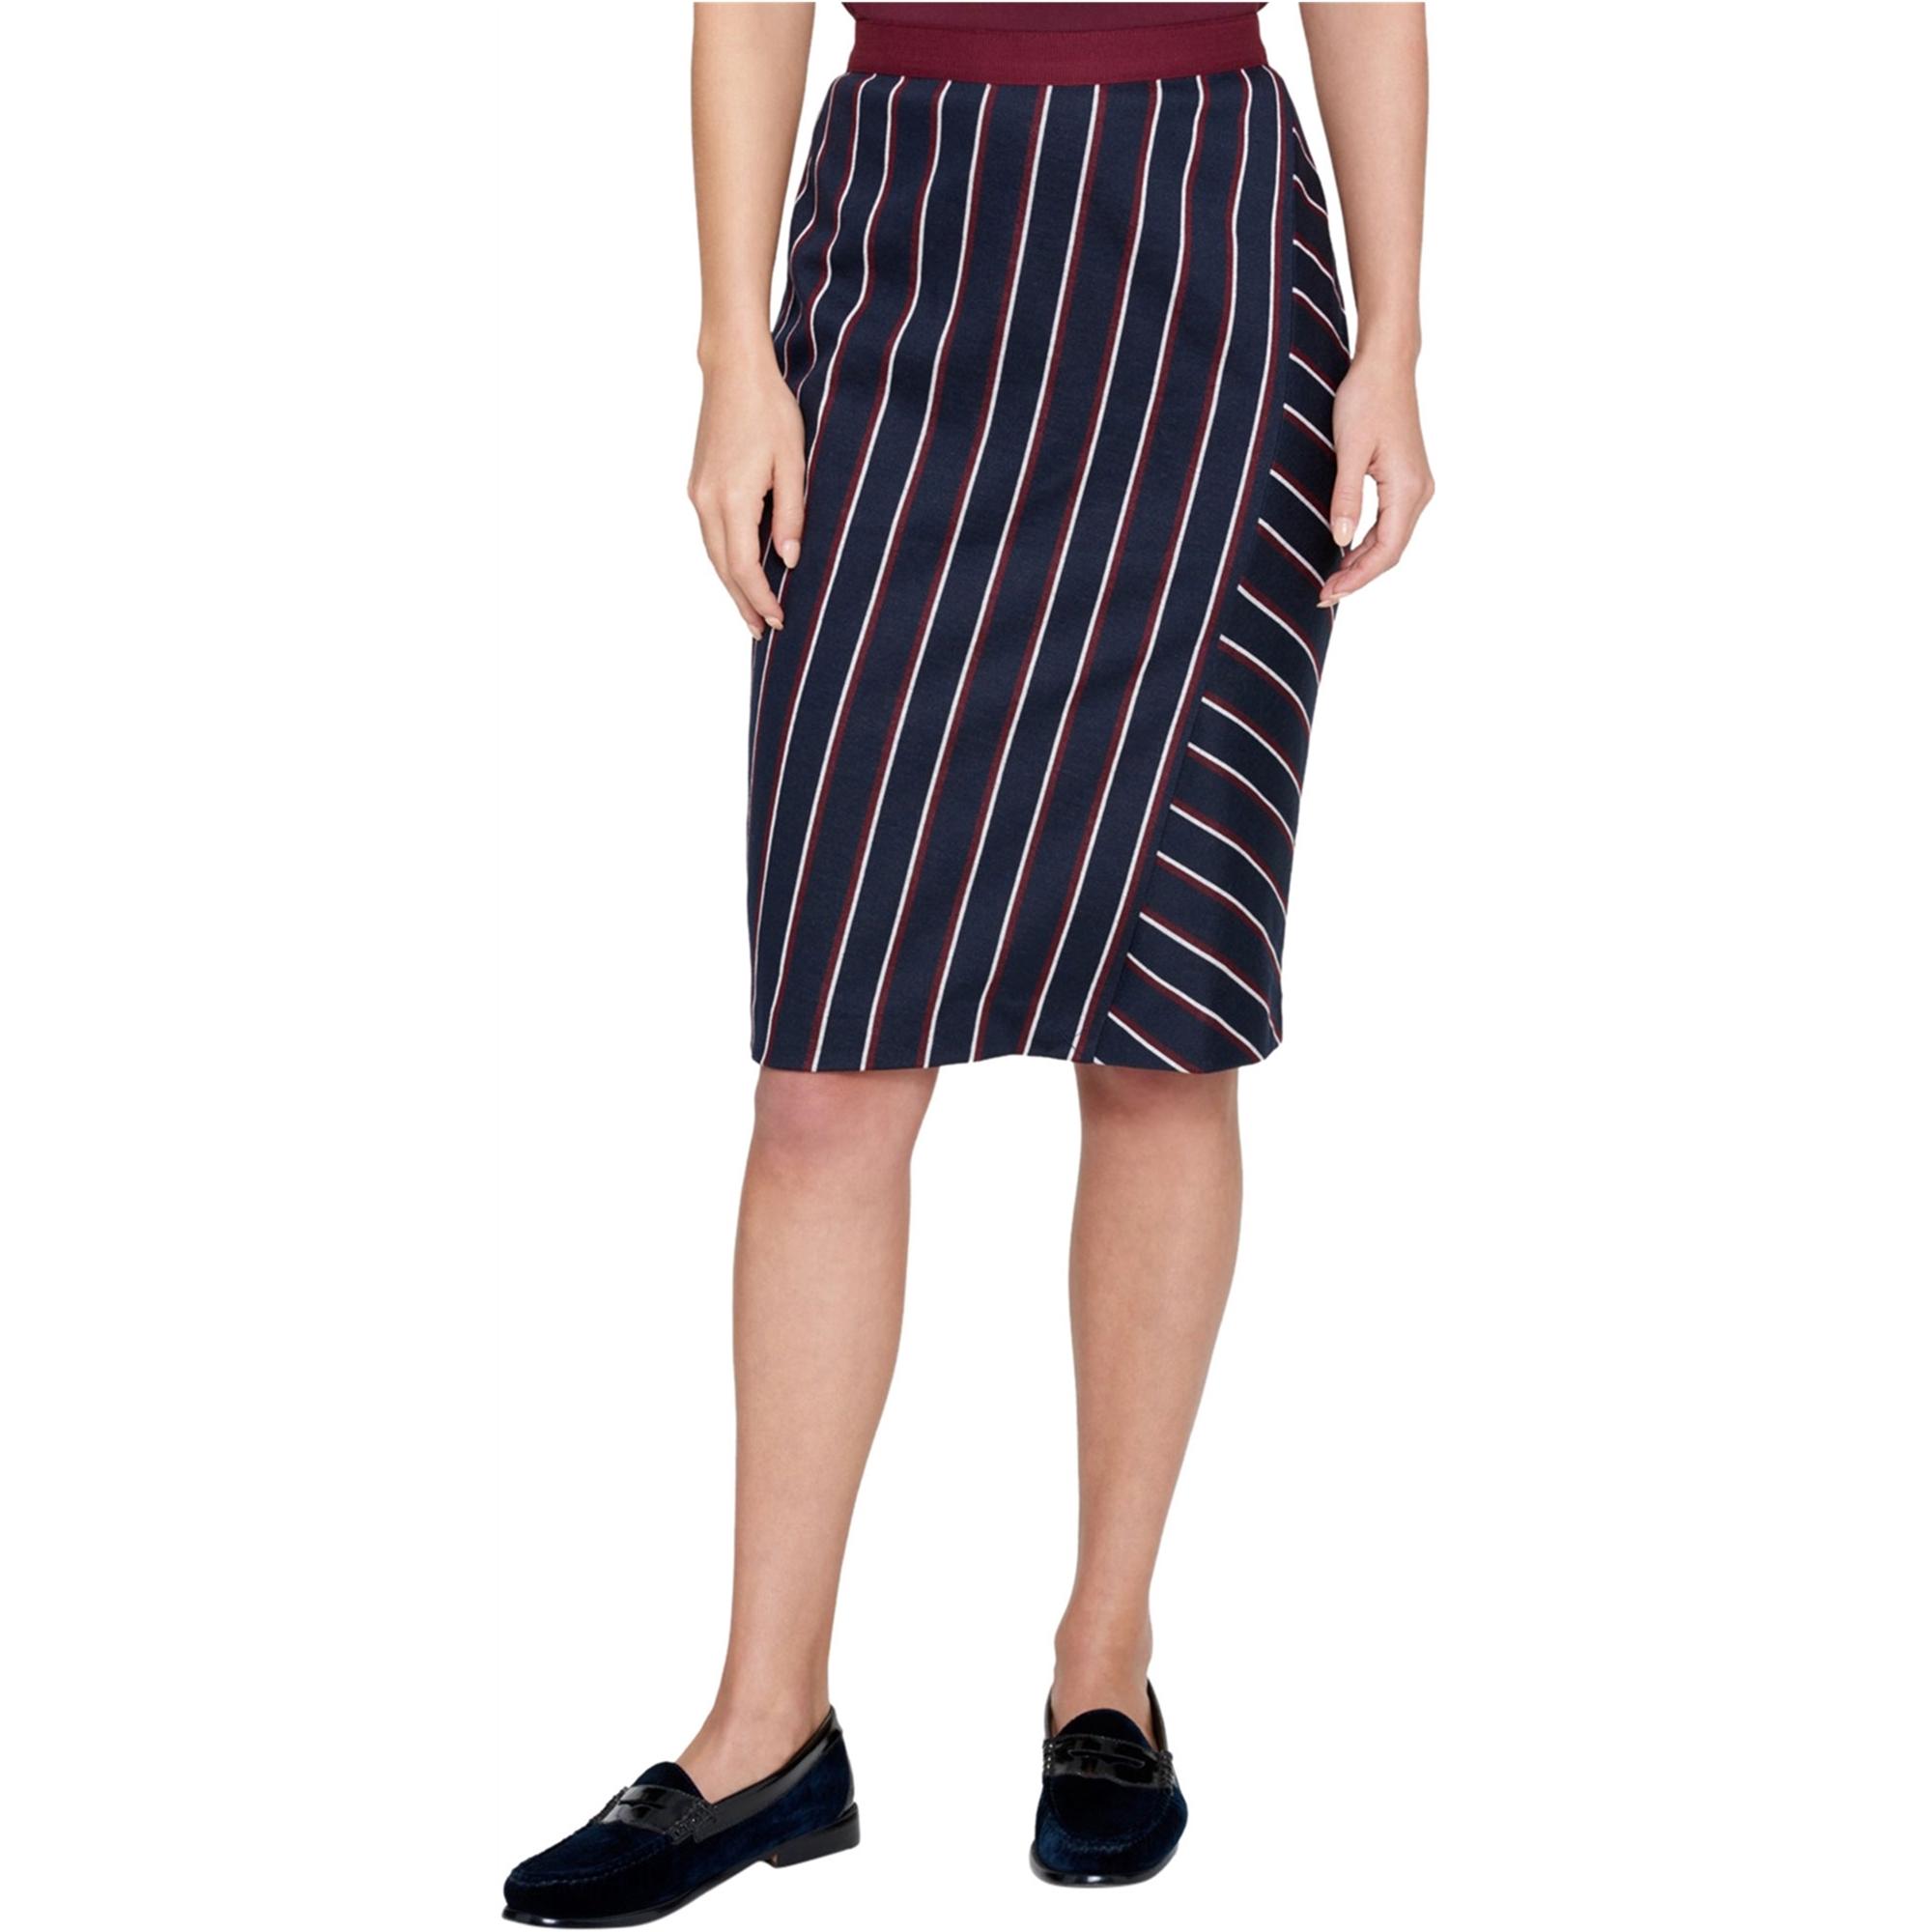 TOMMY HILFIGER Women/'s Herringbone Knee Length Straight Pencil Skirt XXL TEDO